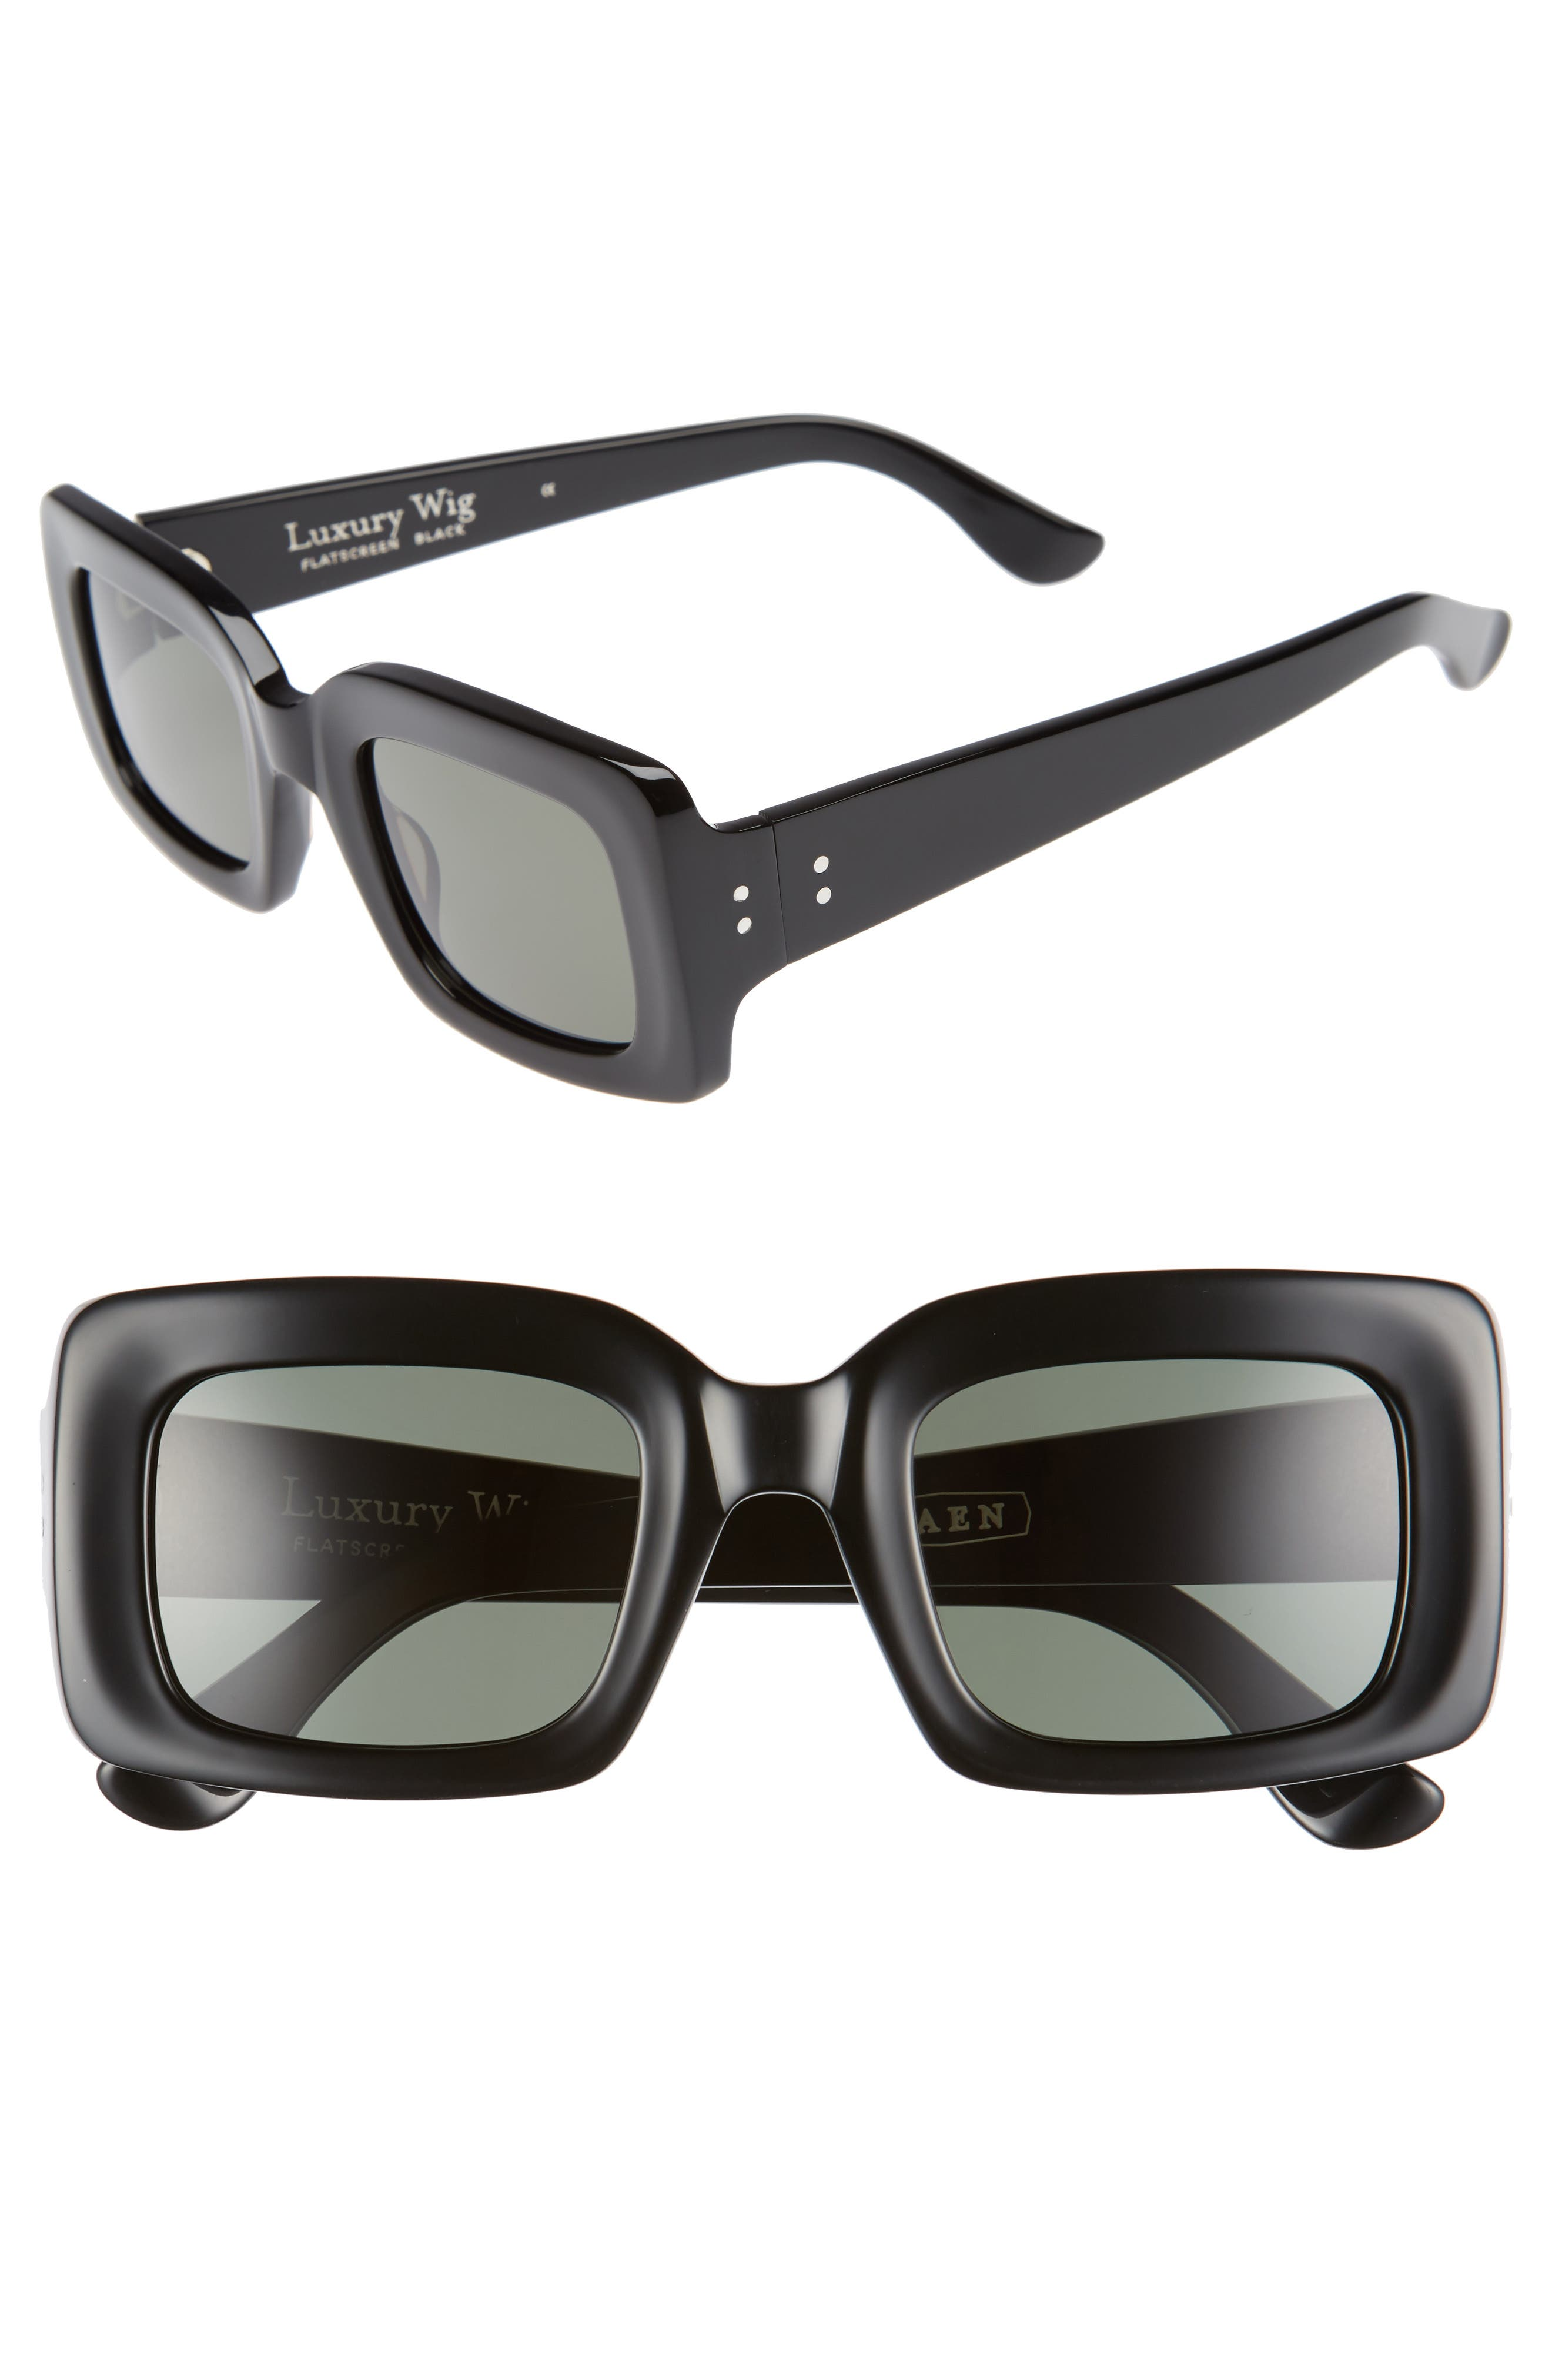 RAEN x Alex Knost Luxury Wig Flatscreen 49mm Square Sunglasses